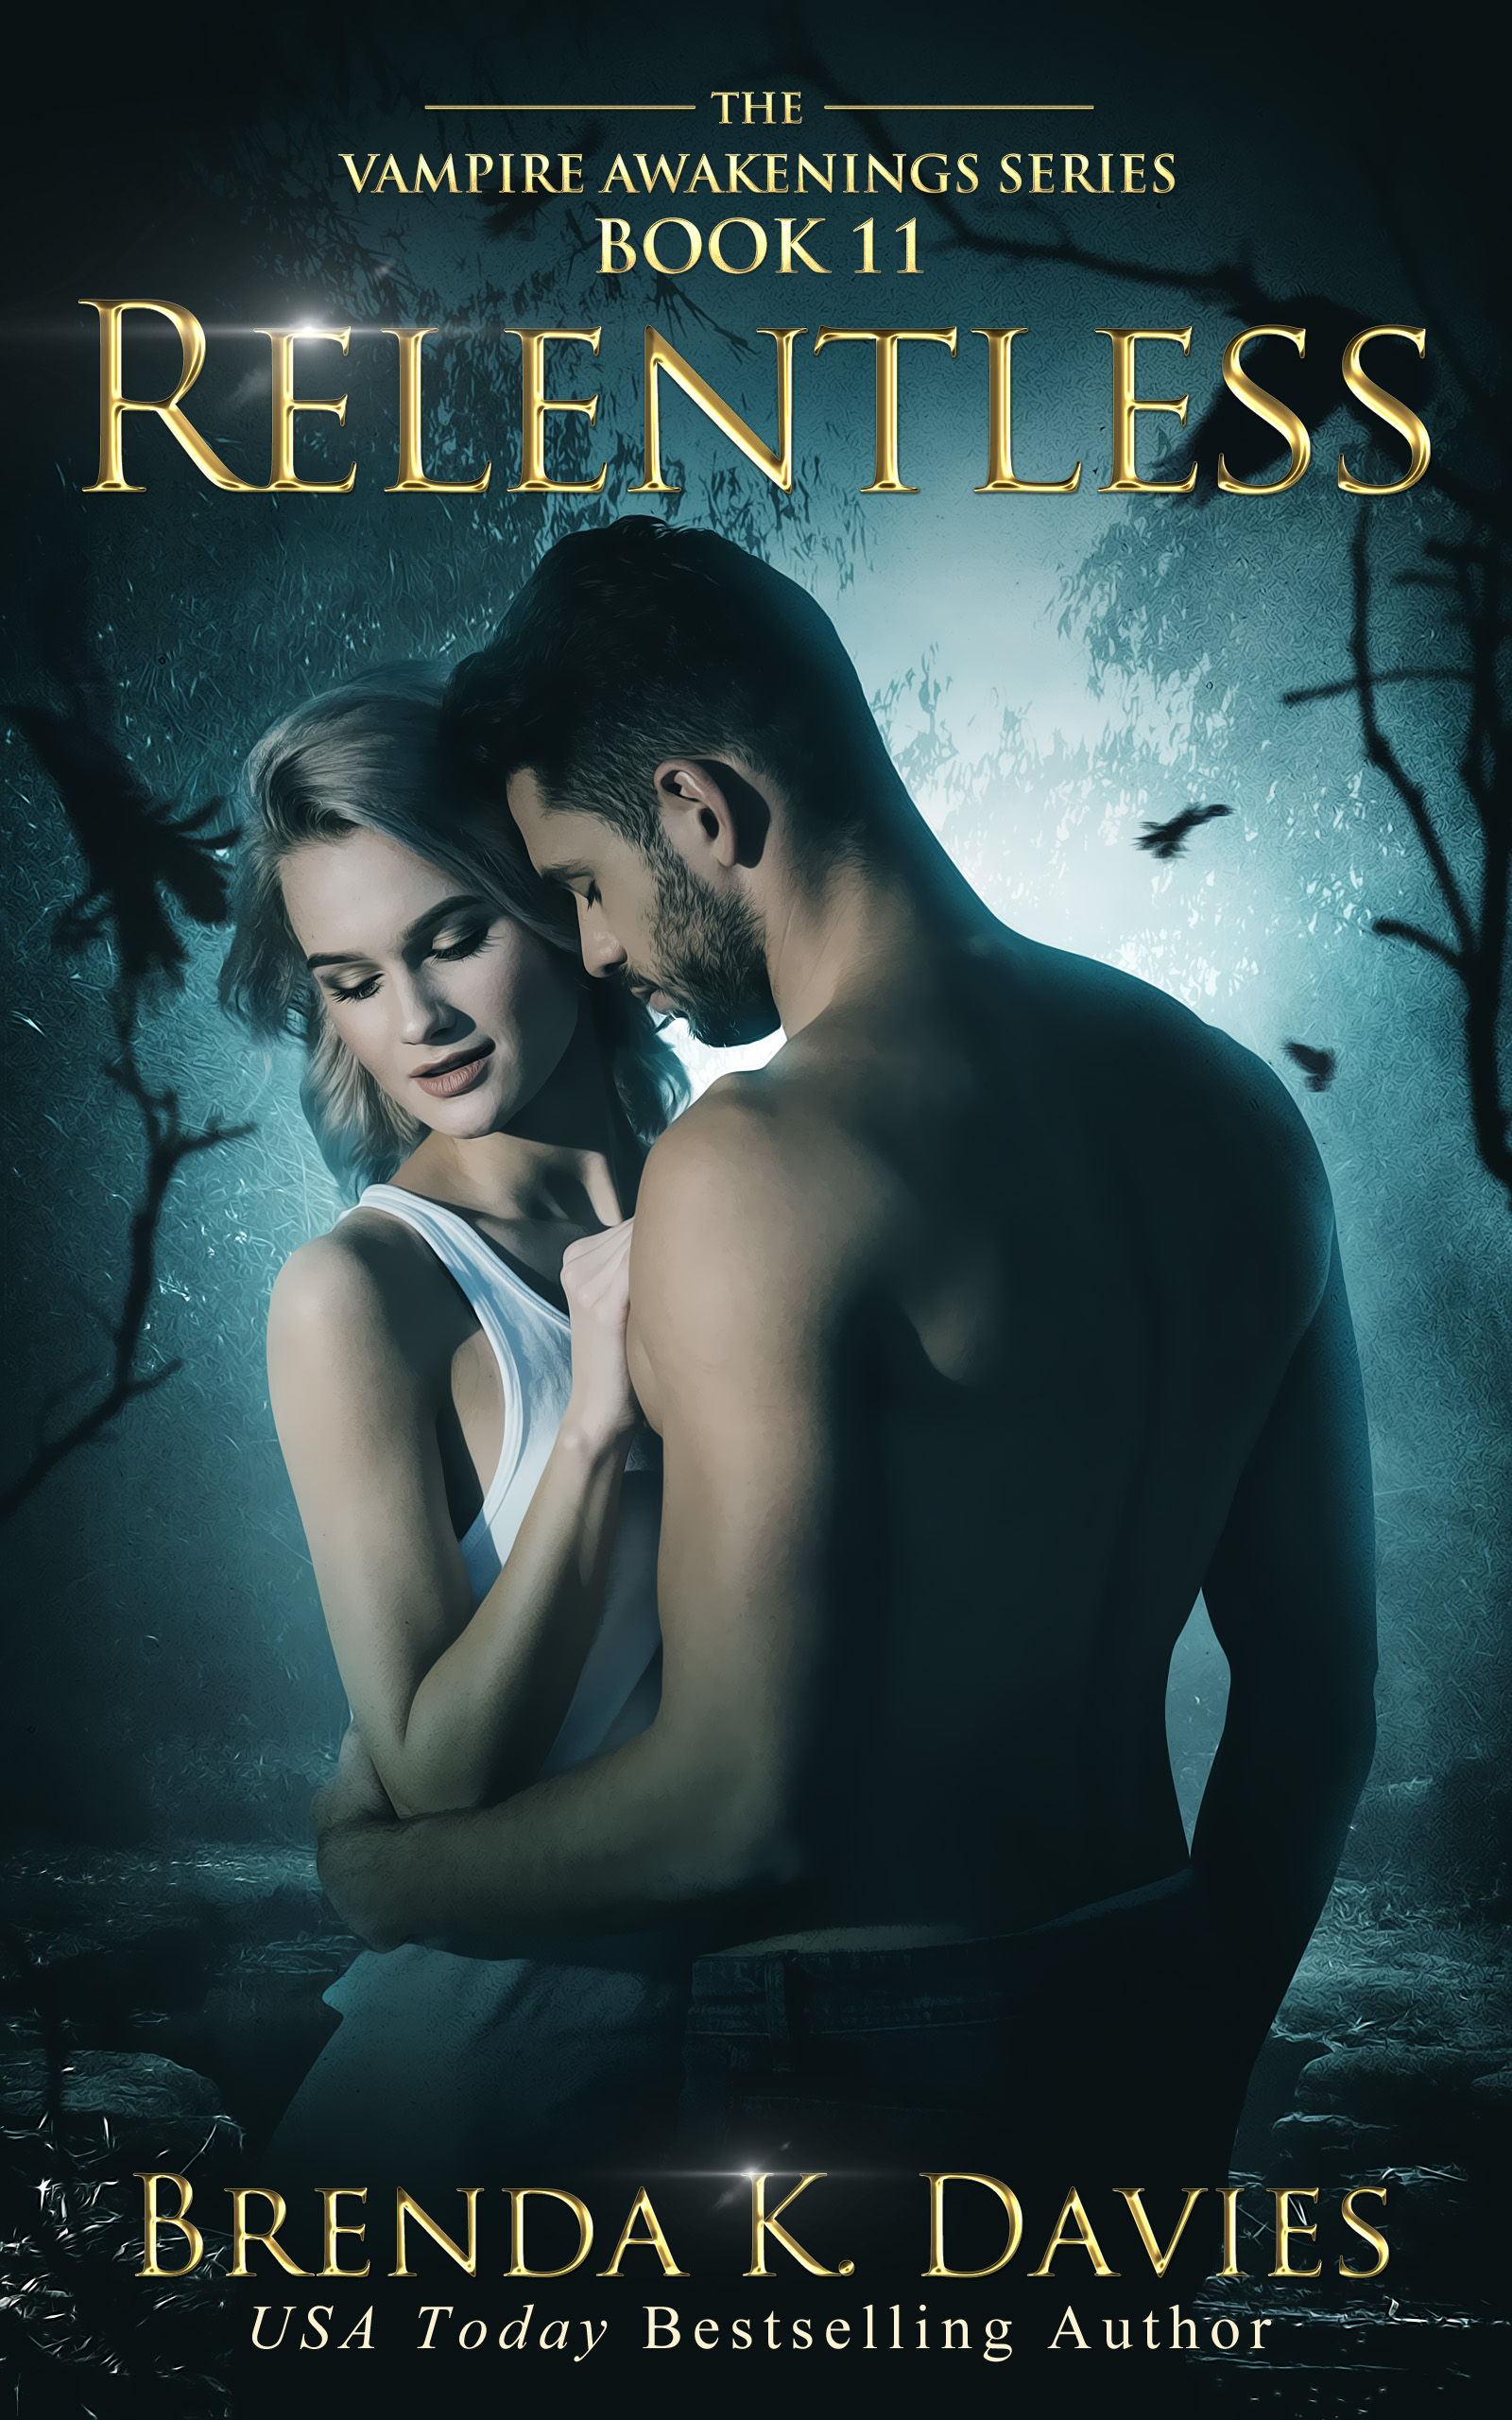 Smashwords Relentless Vampire Awakenings Book 11 A Book By Brenda K Davies